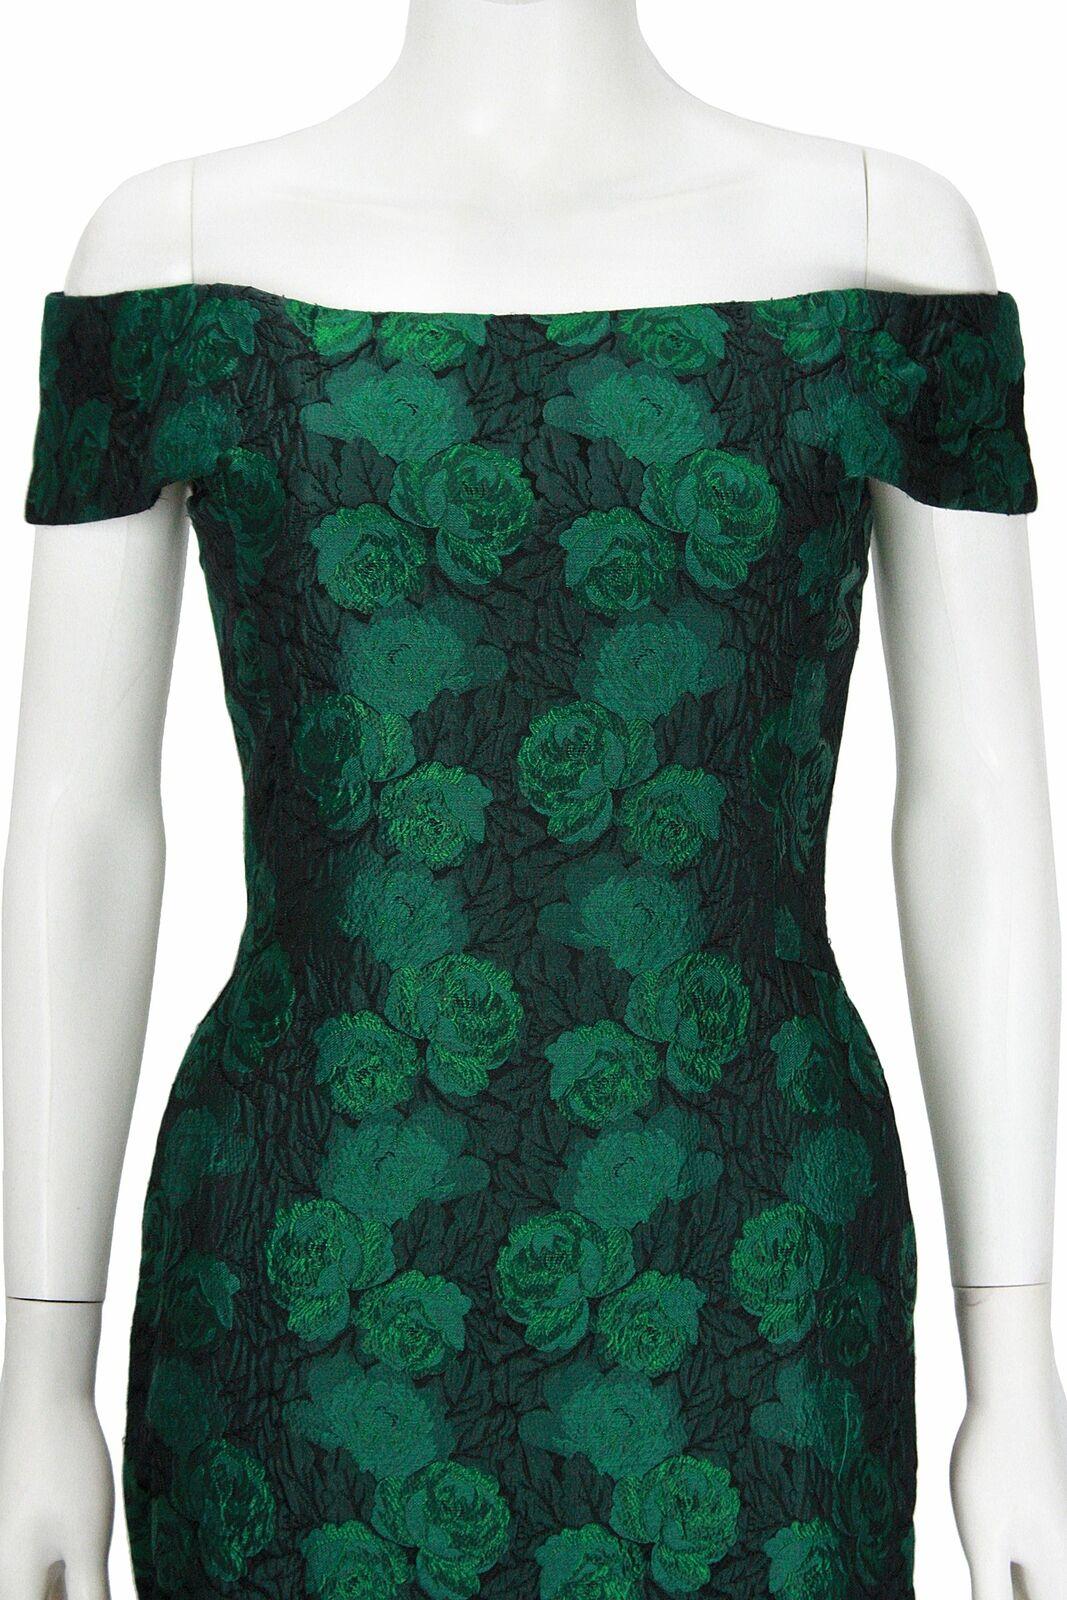 ARNOLD SCAASI 1980s Dark Green Floral Brocade Gow… - image 7